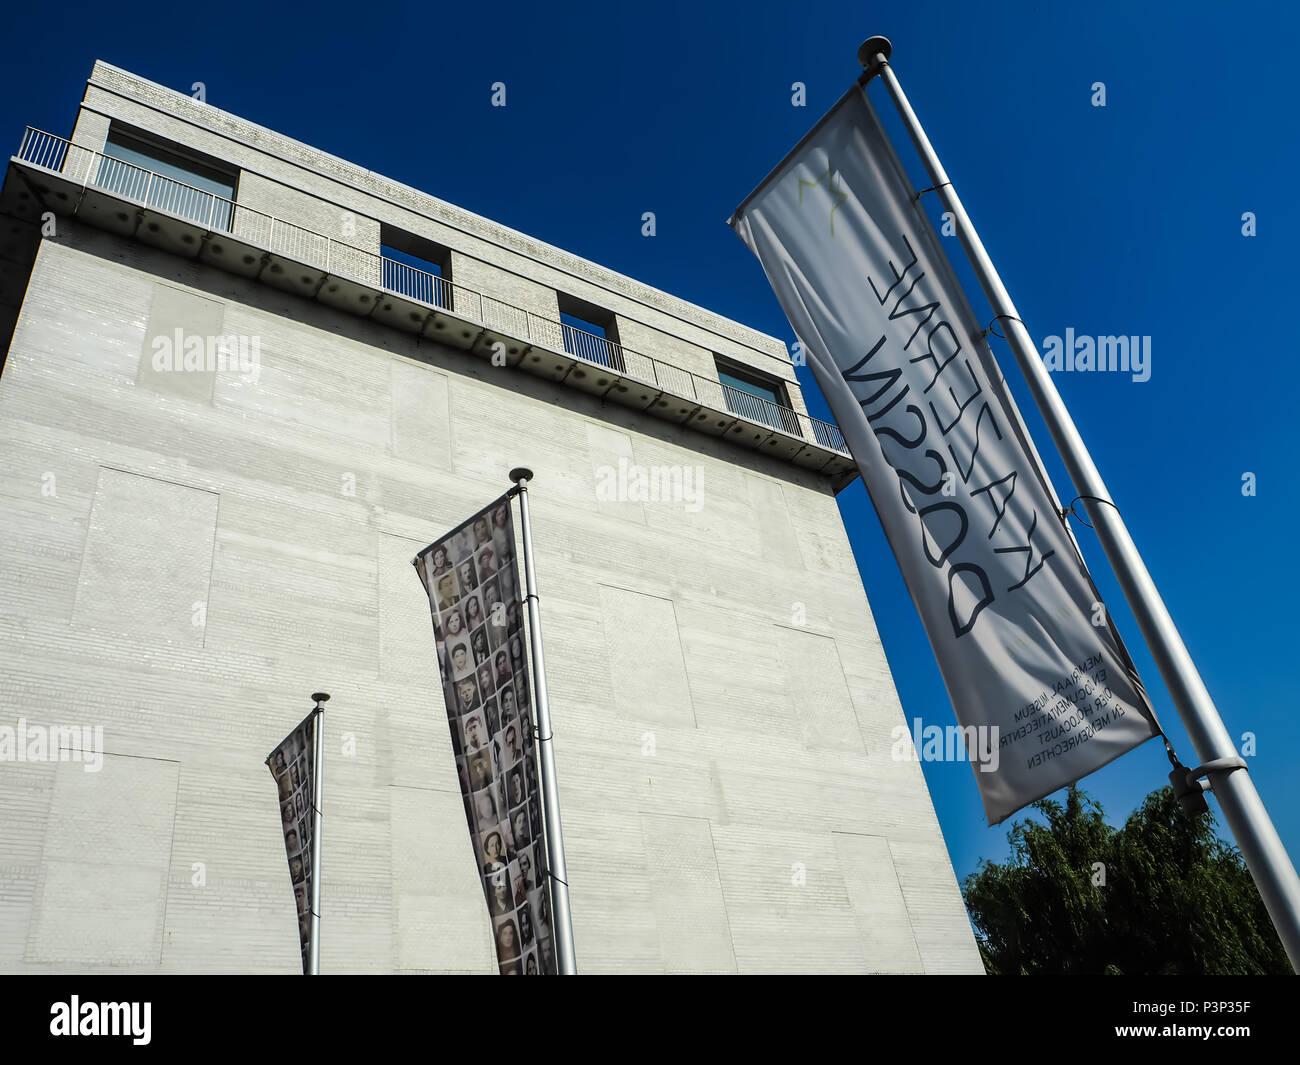 The Kazerne Dossin Museum And Memorial In Commemoration Of World War 2 Holocaust Designed By Bob Van Reeth Mechelen Belgium